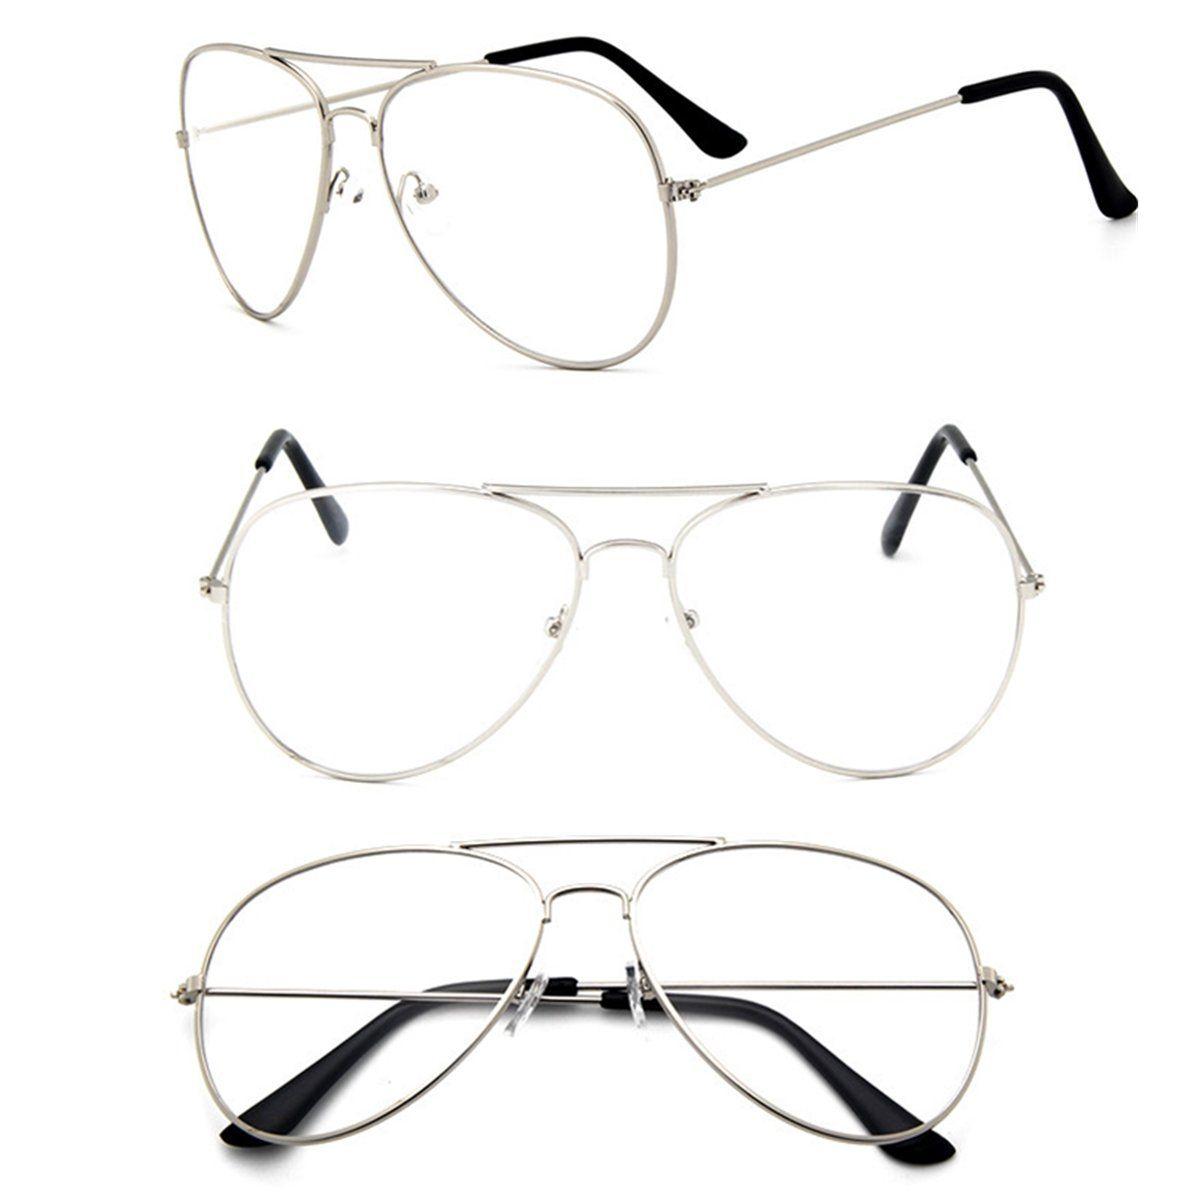 5c8c720244ccf Men Women Aviator Pilot Shape Metal Frame Clear Lens Glasses Specs ...